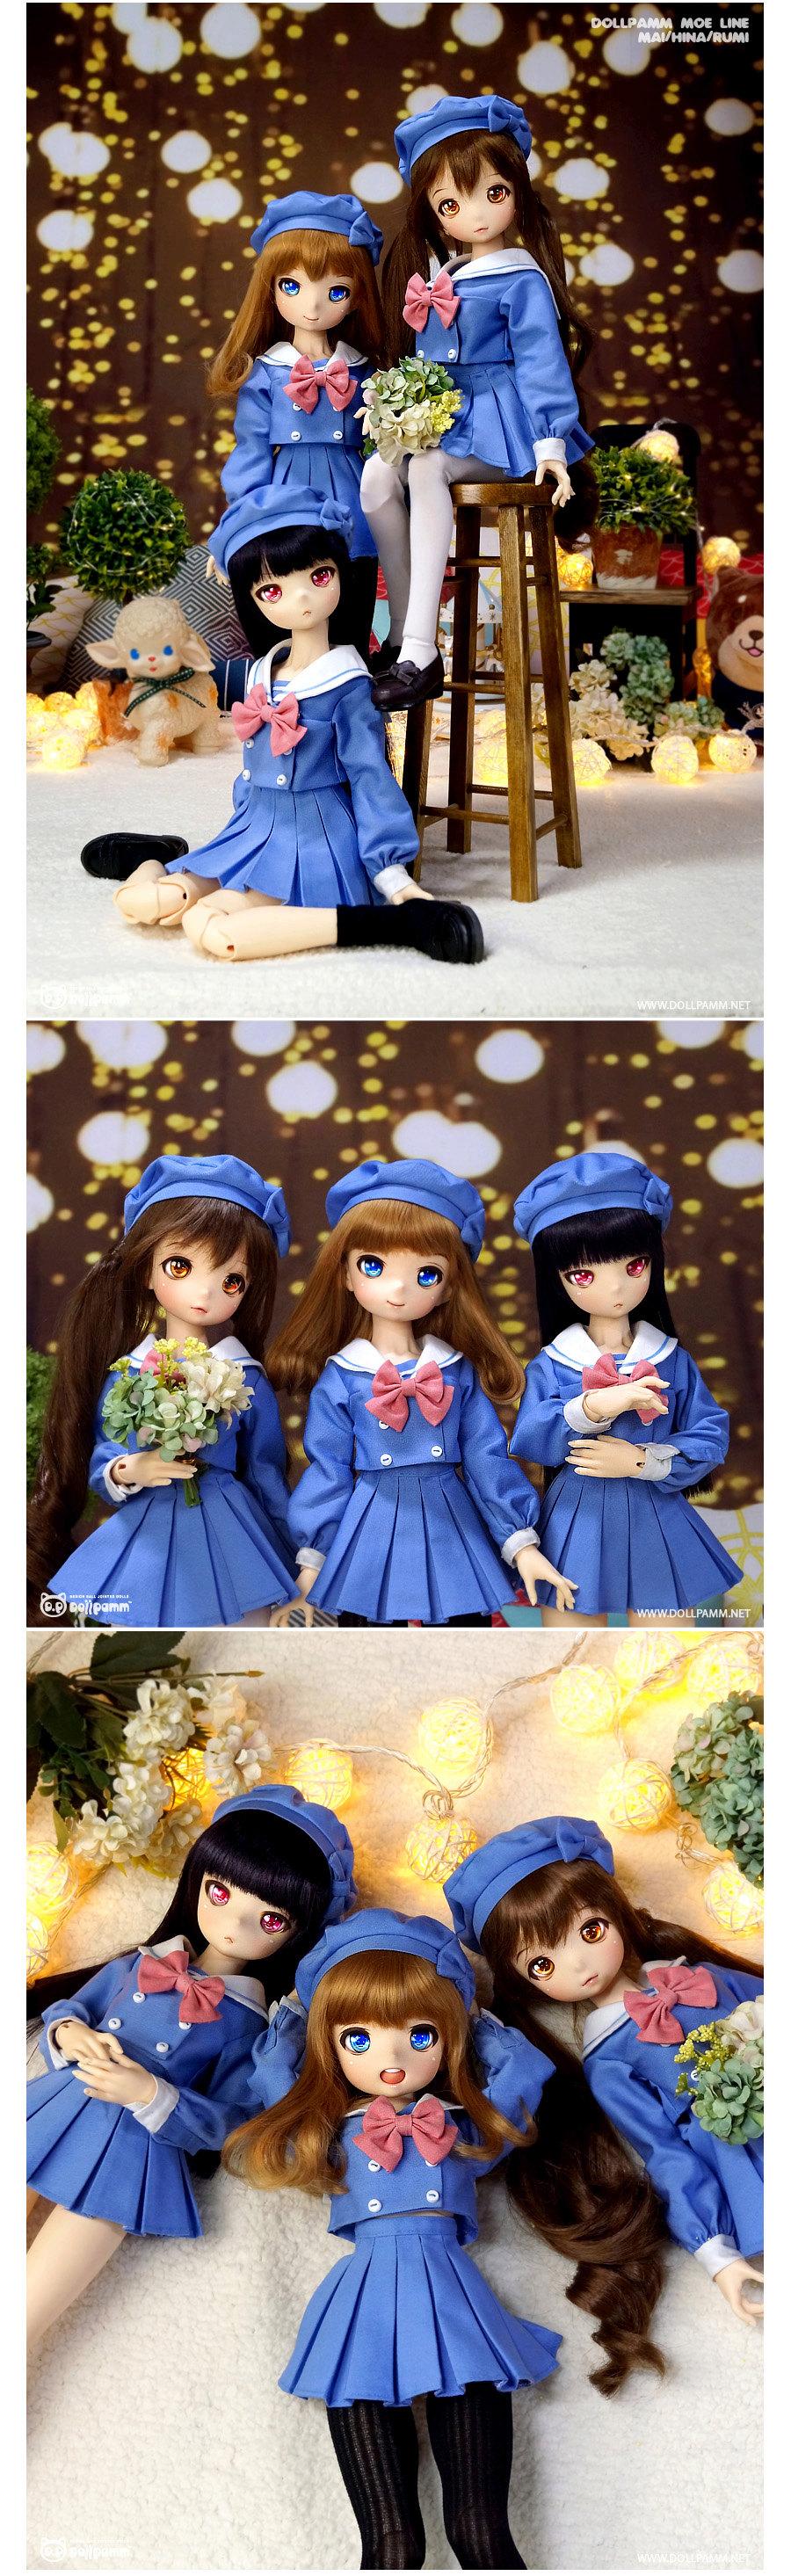 [Dollpamm] Moe Pam Mai, Hina & Rumi - Page 2 All10